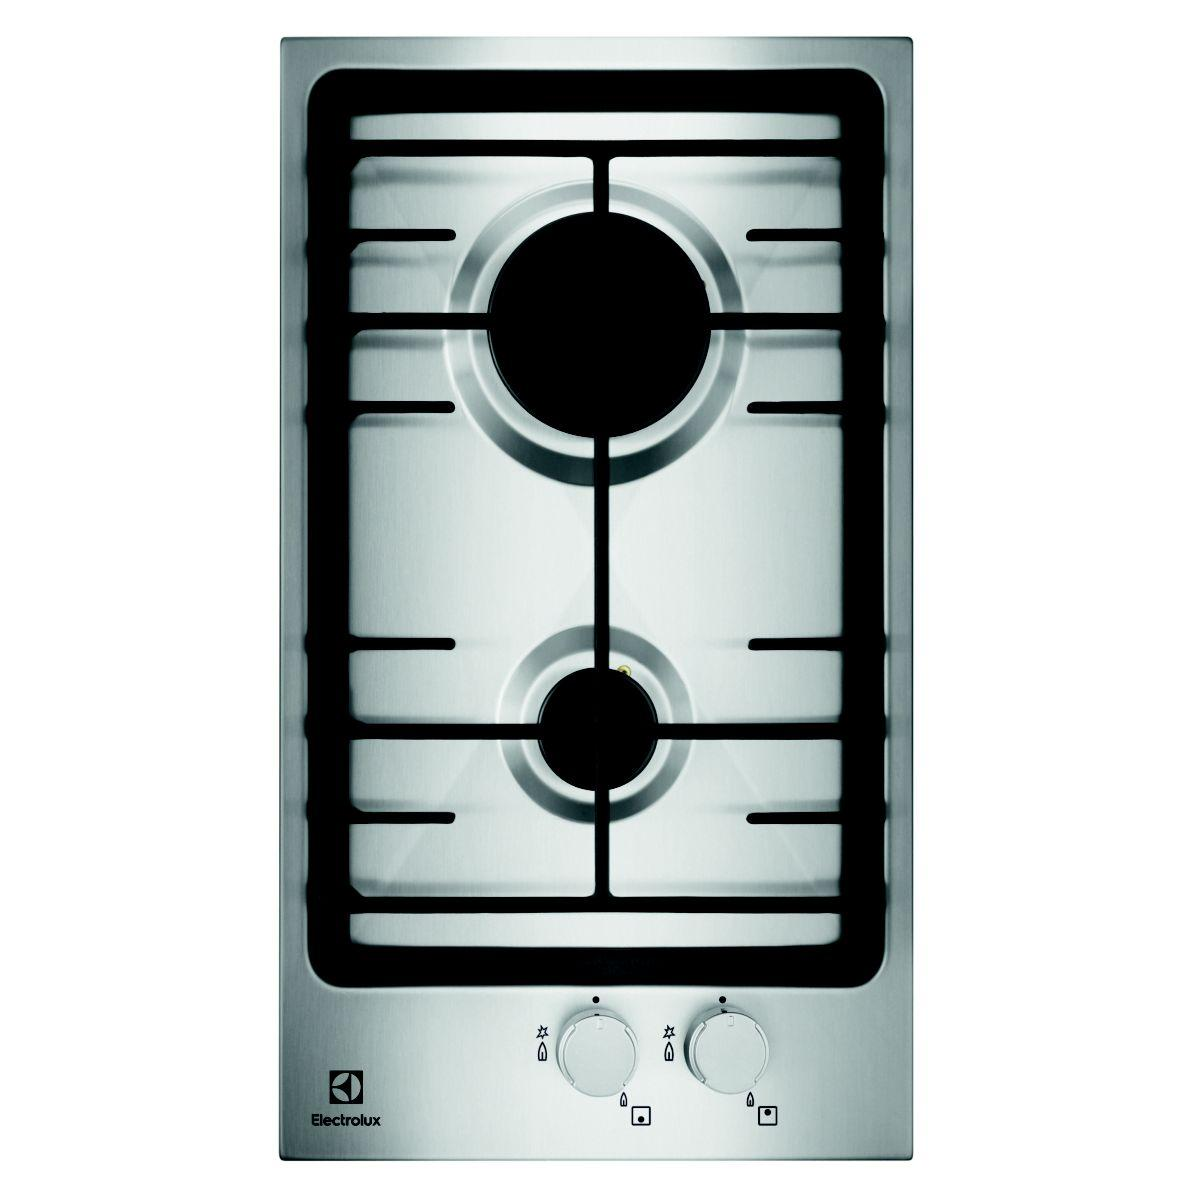 Domino gaz electrolux egg3322nvx - livraison offerte : code premium (photo)